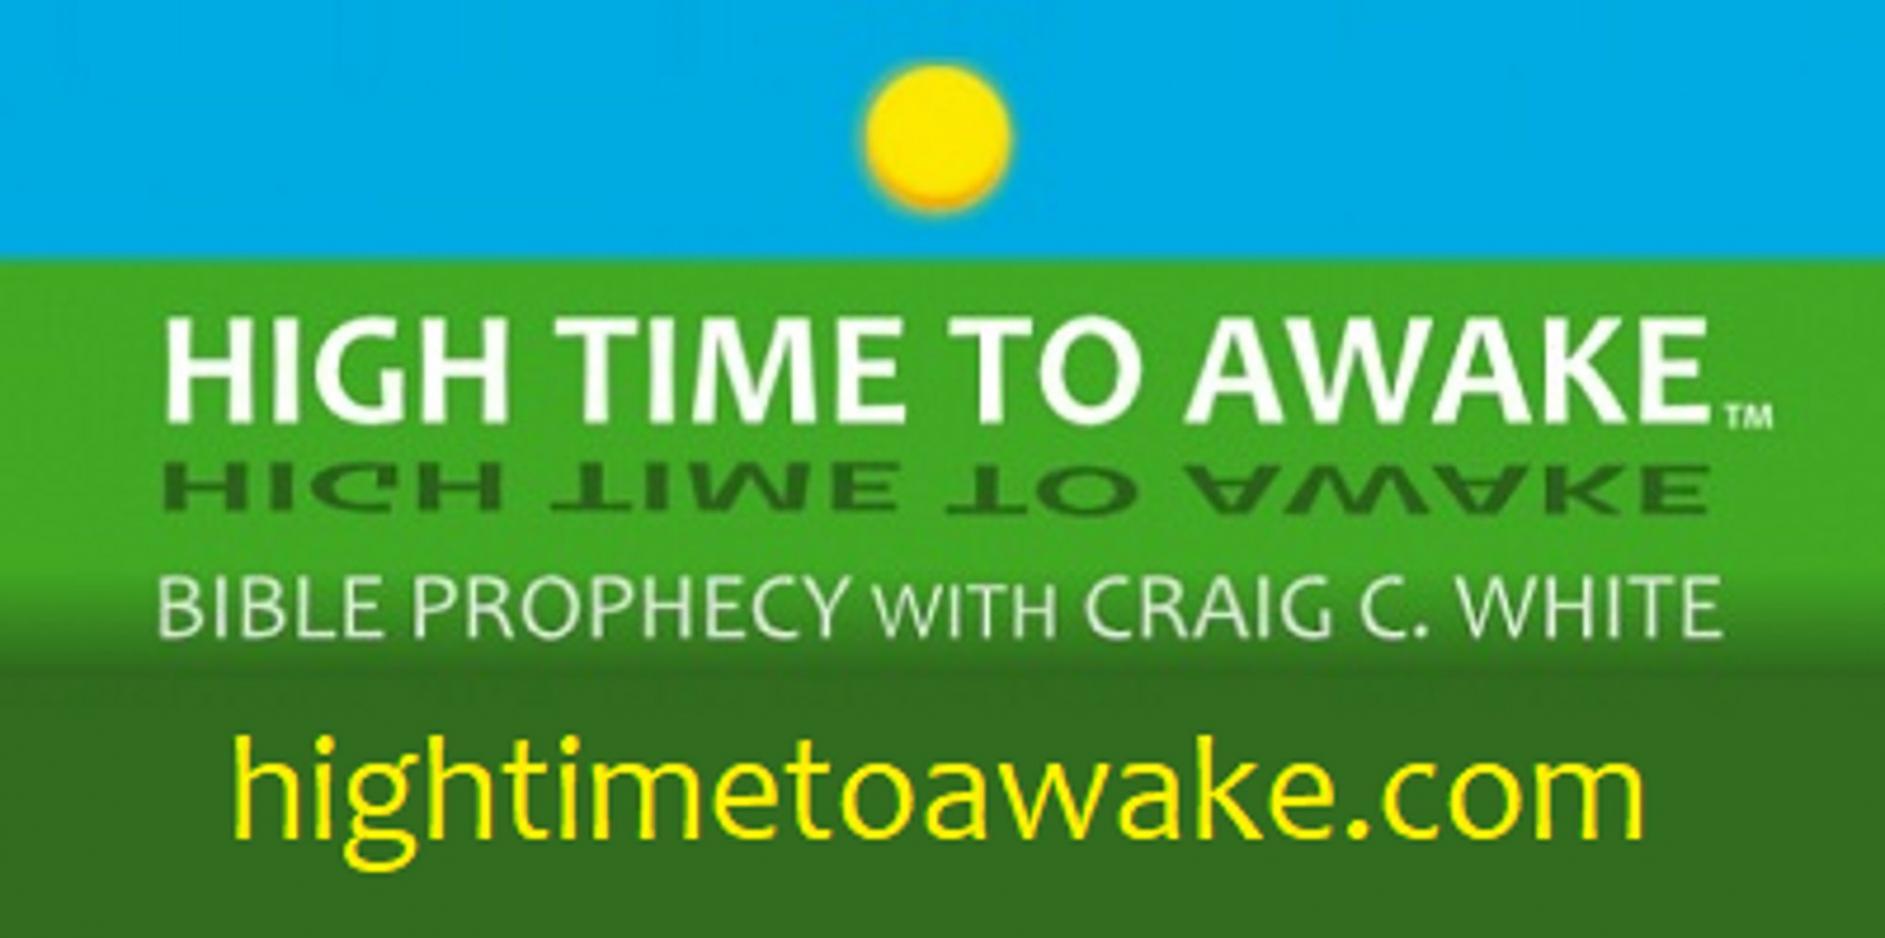 High Time to Awake